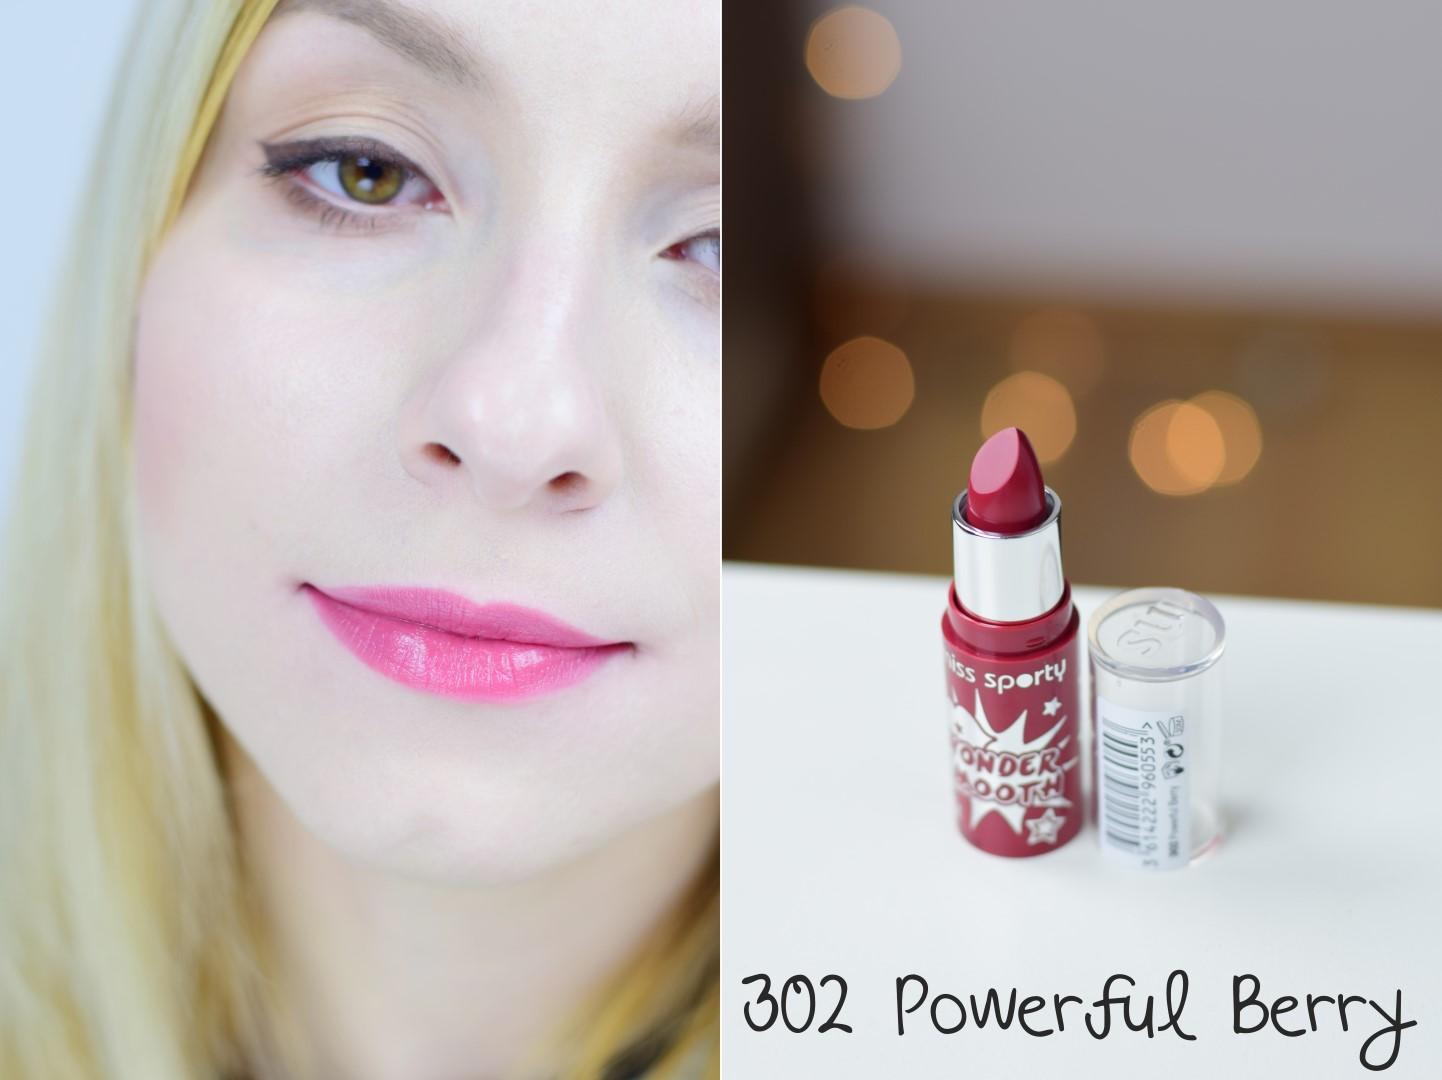 miss_sporty_wonder_smooth_blog_opinia_recenzja_swatche_powerful_berry_302